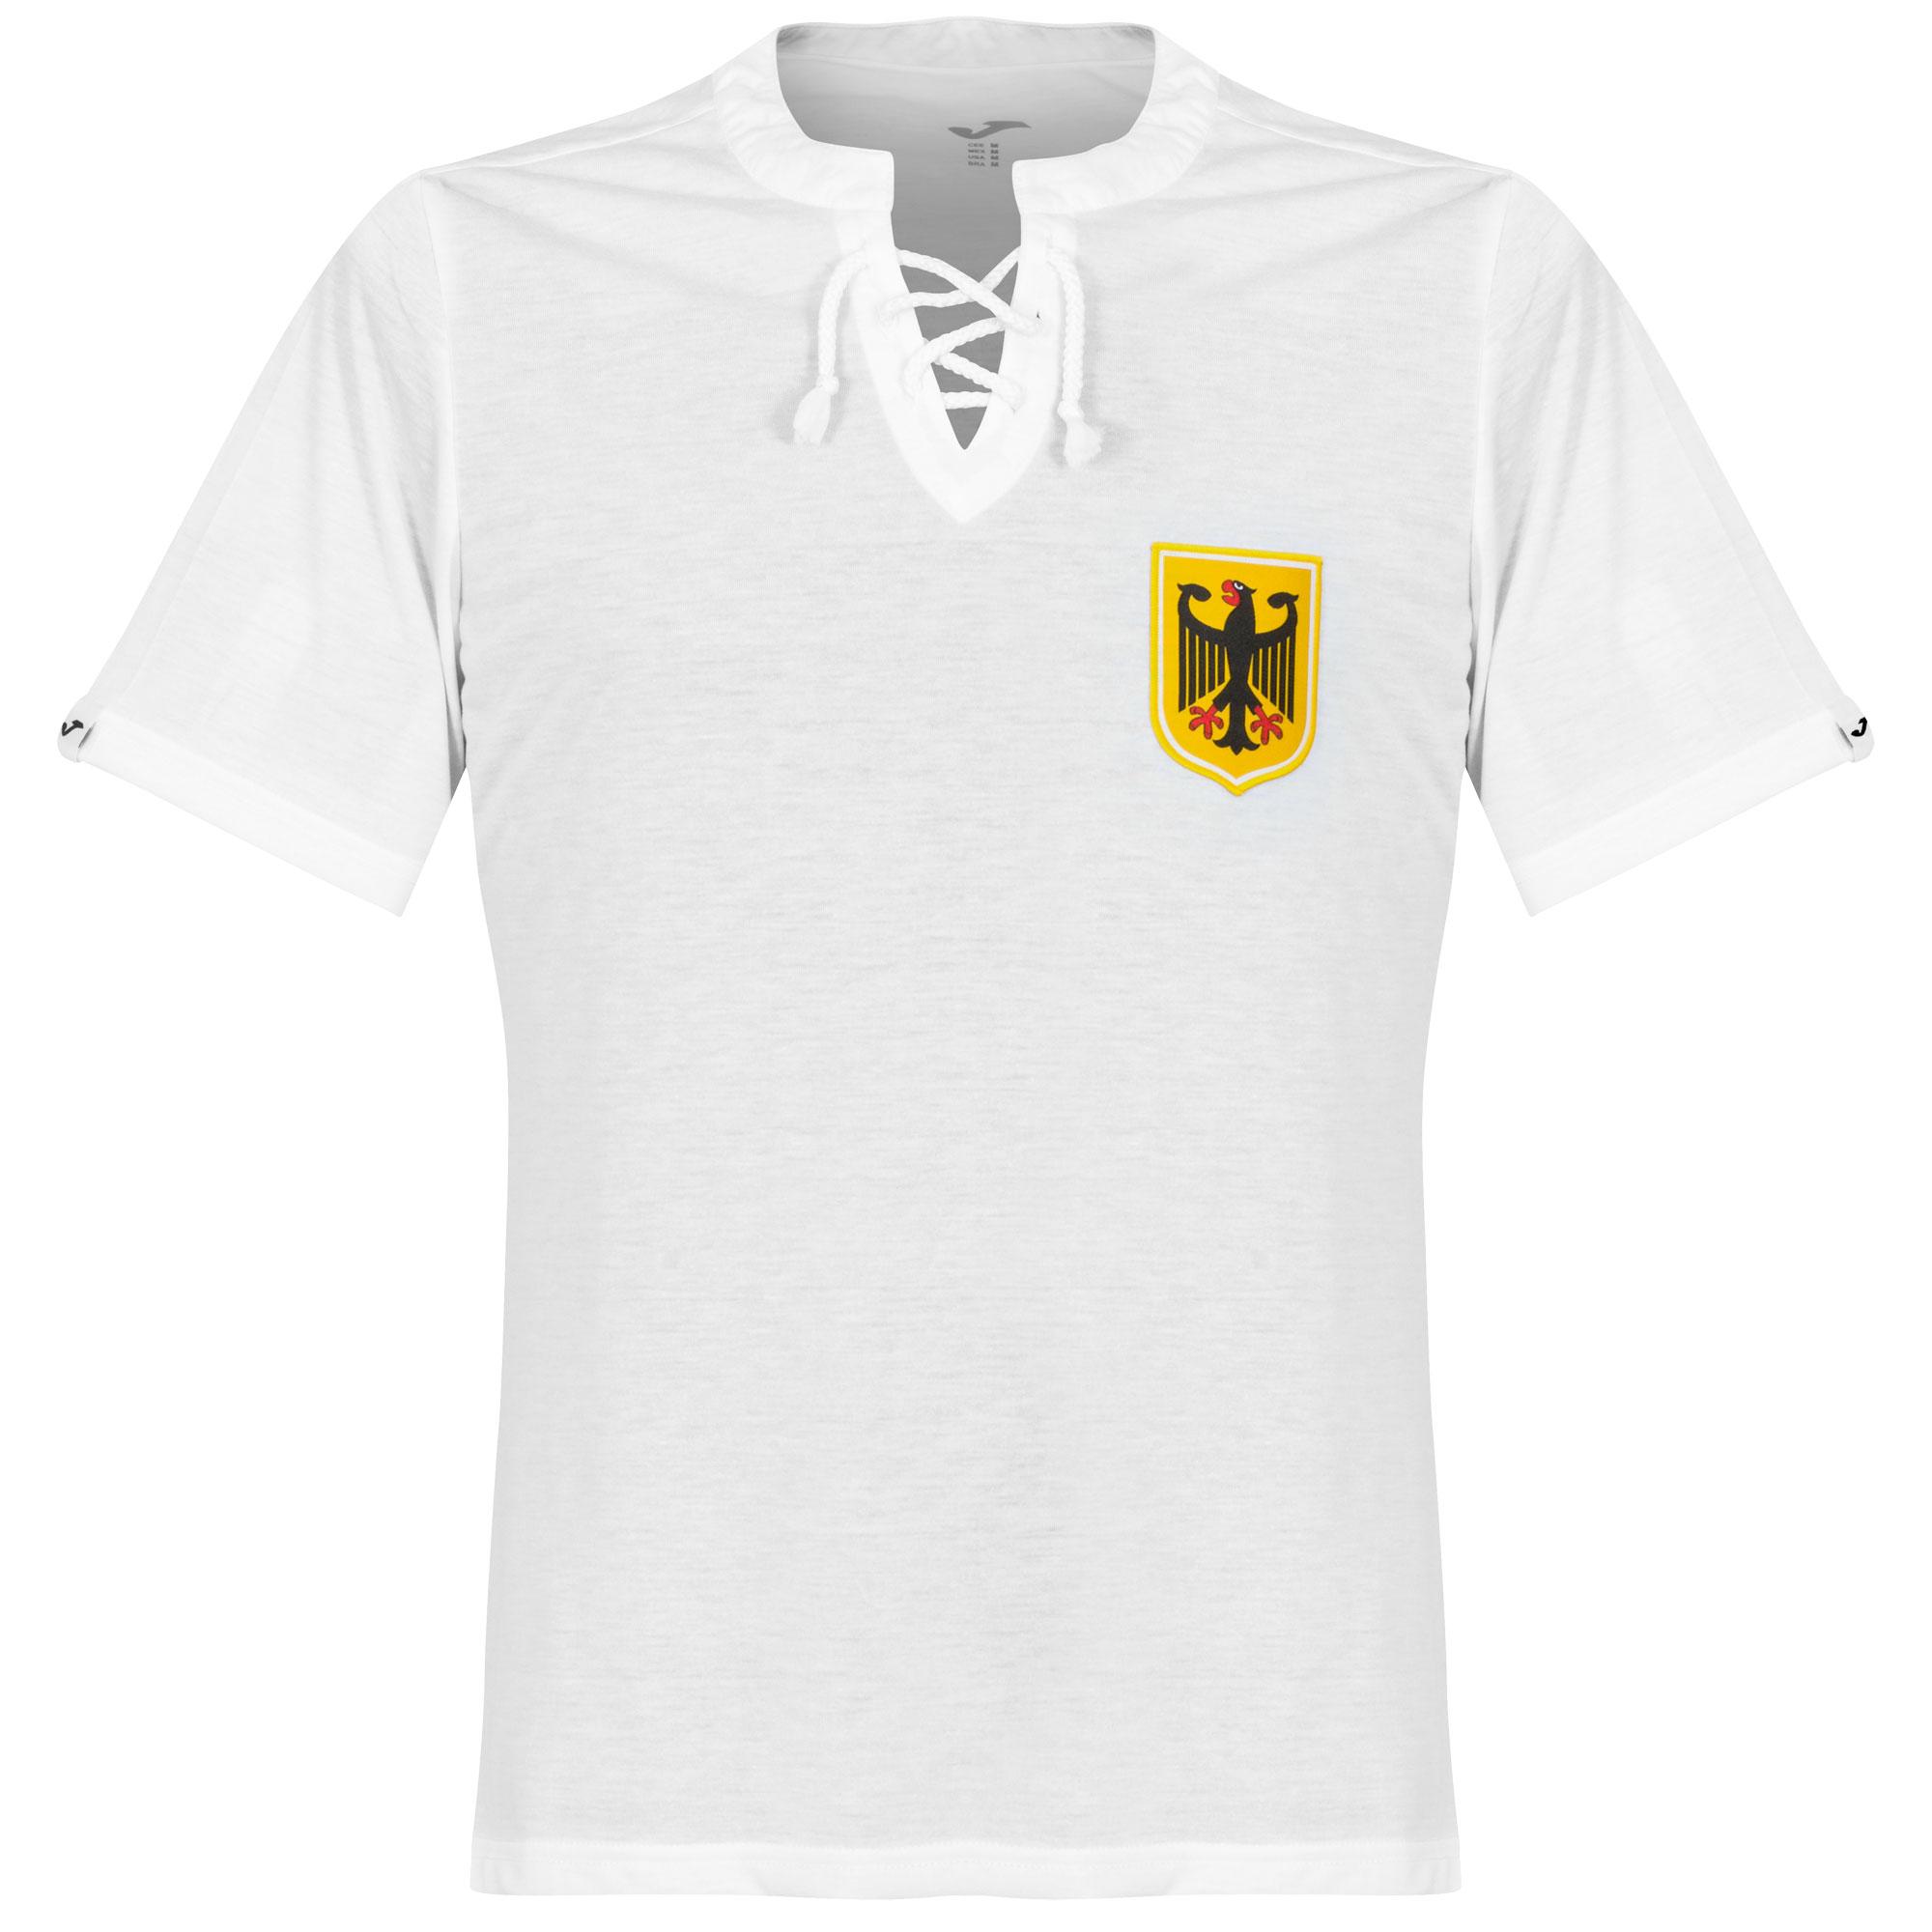 Germany 1950s Retro Shirt - White